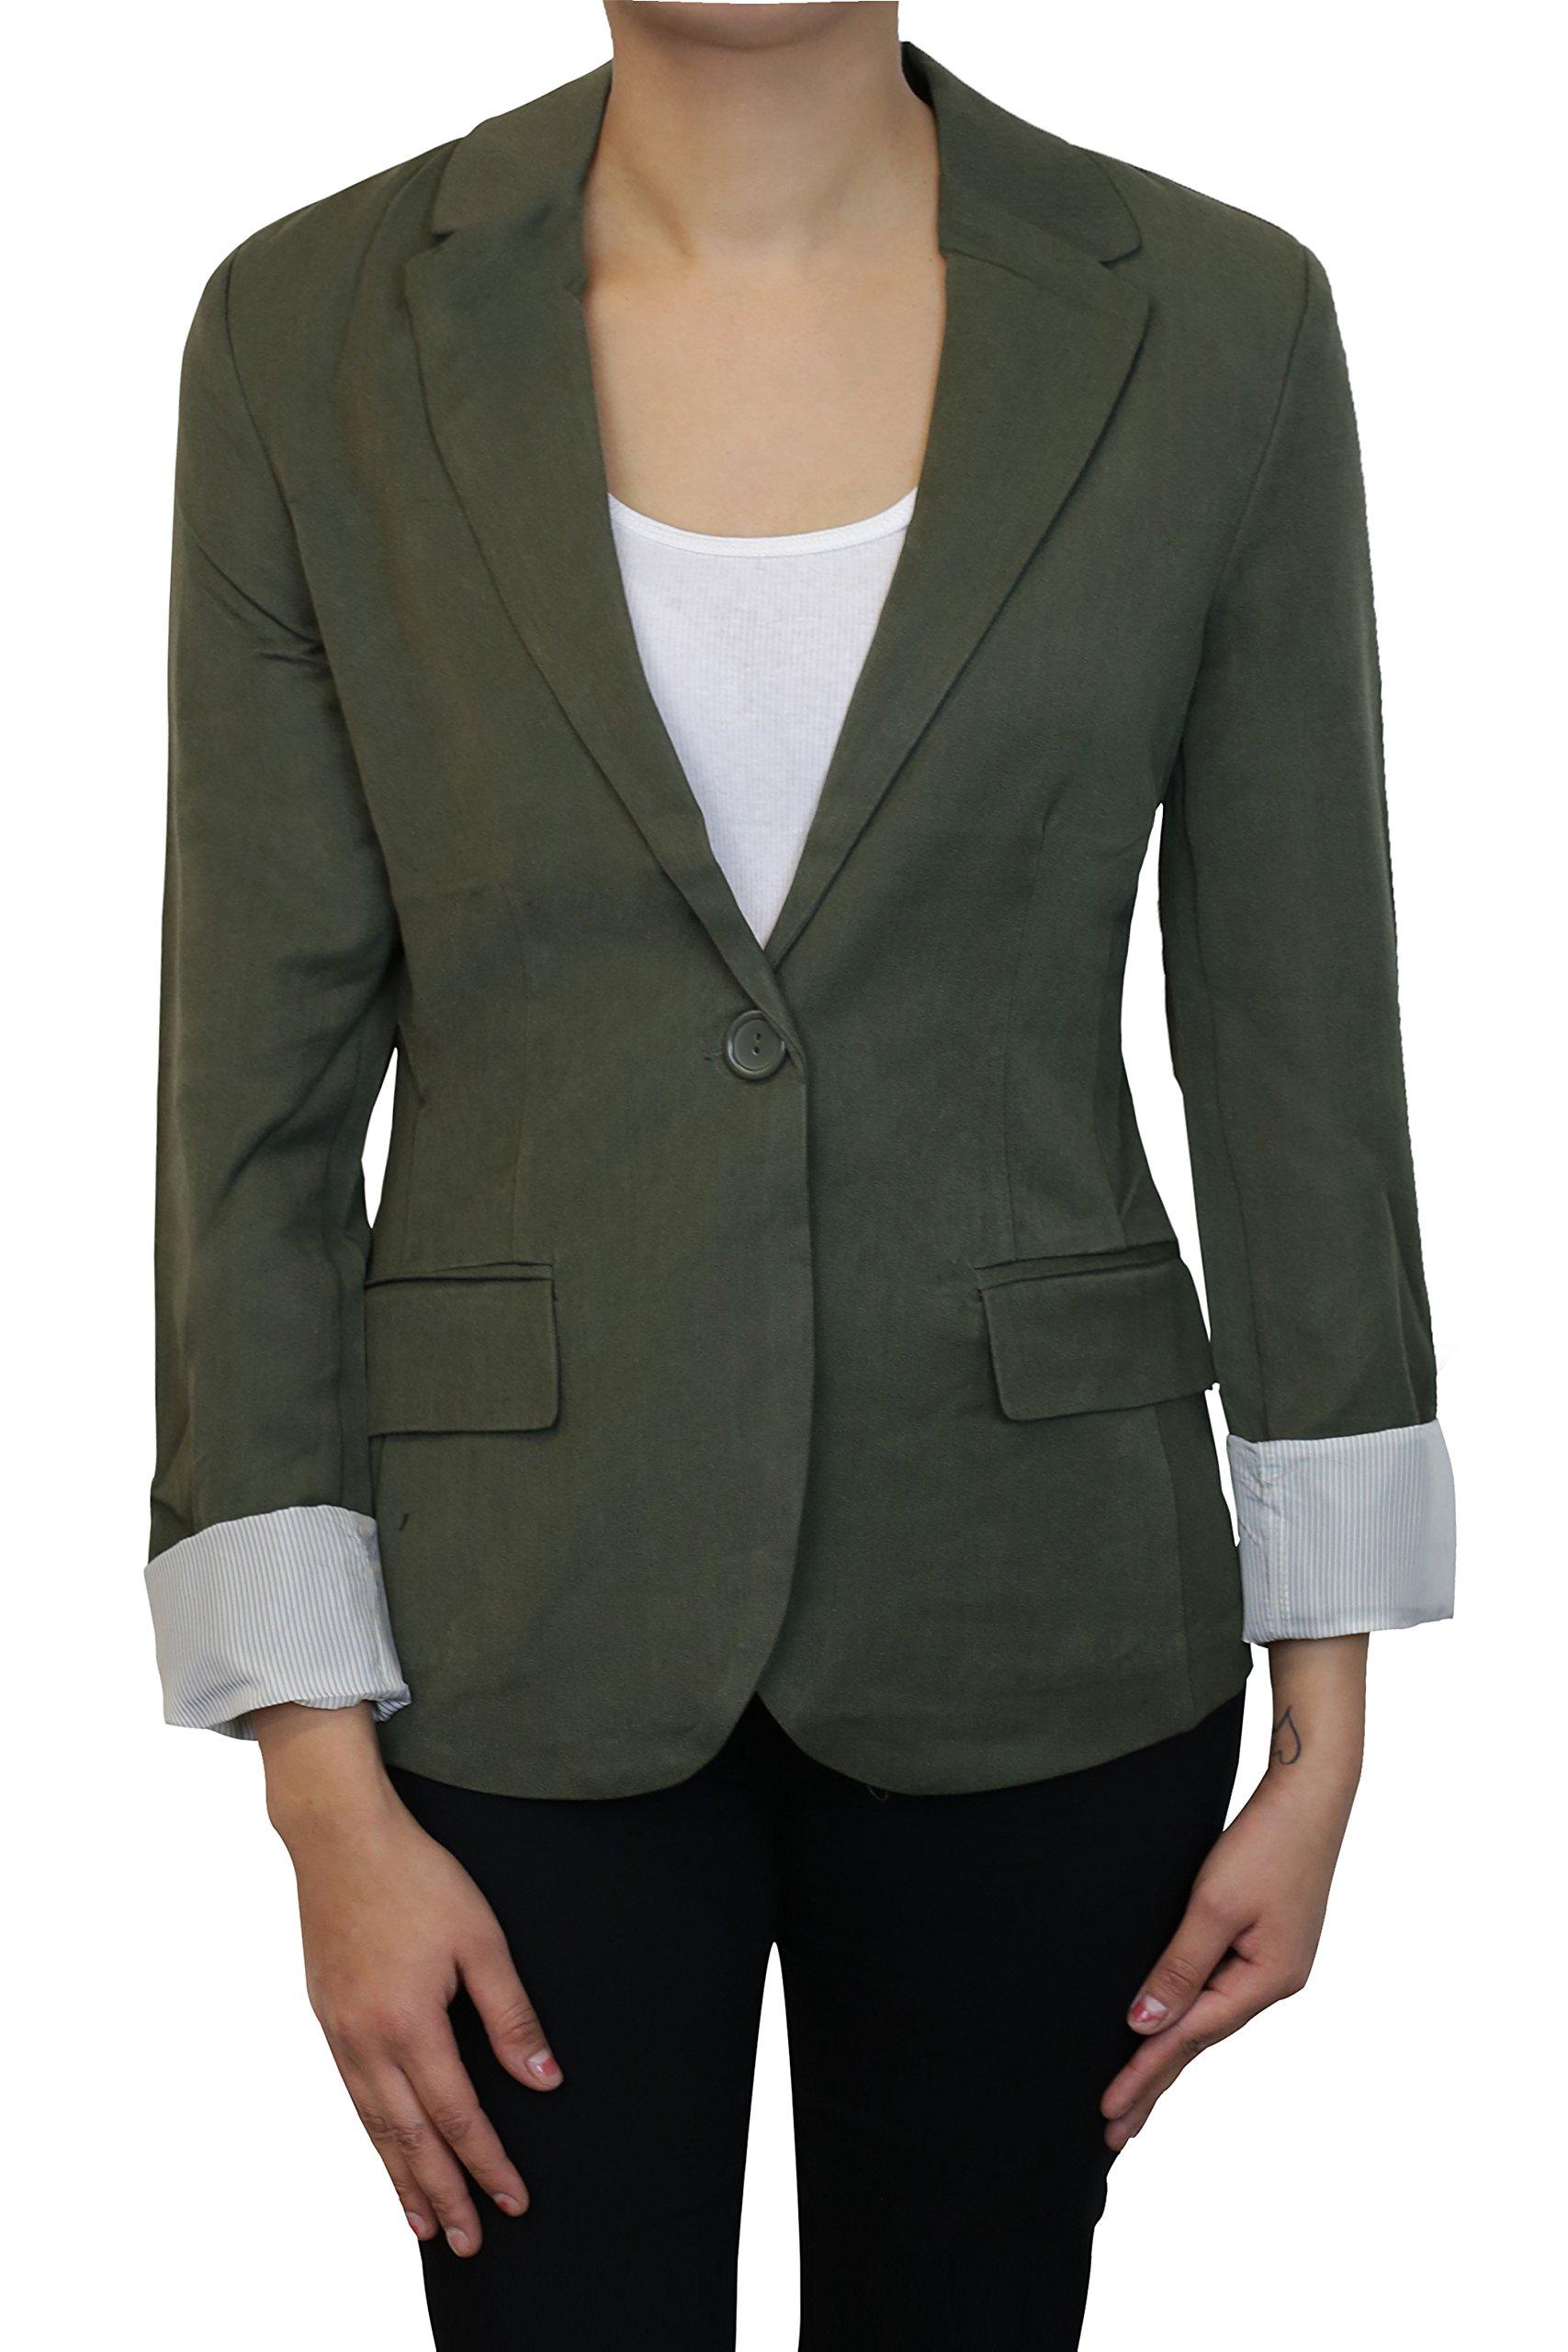 Instar Mode Women's Versatile Business Attire Blazers in Varies Styles (B22117 Olive, Medium)